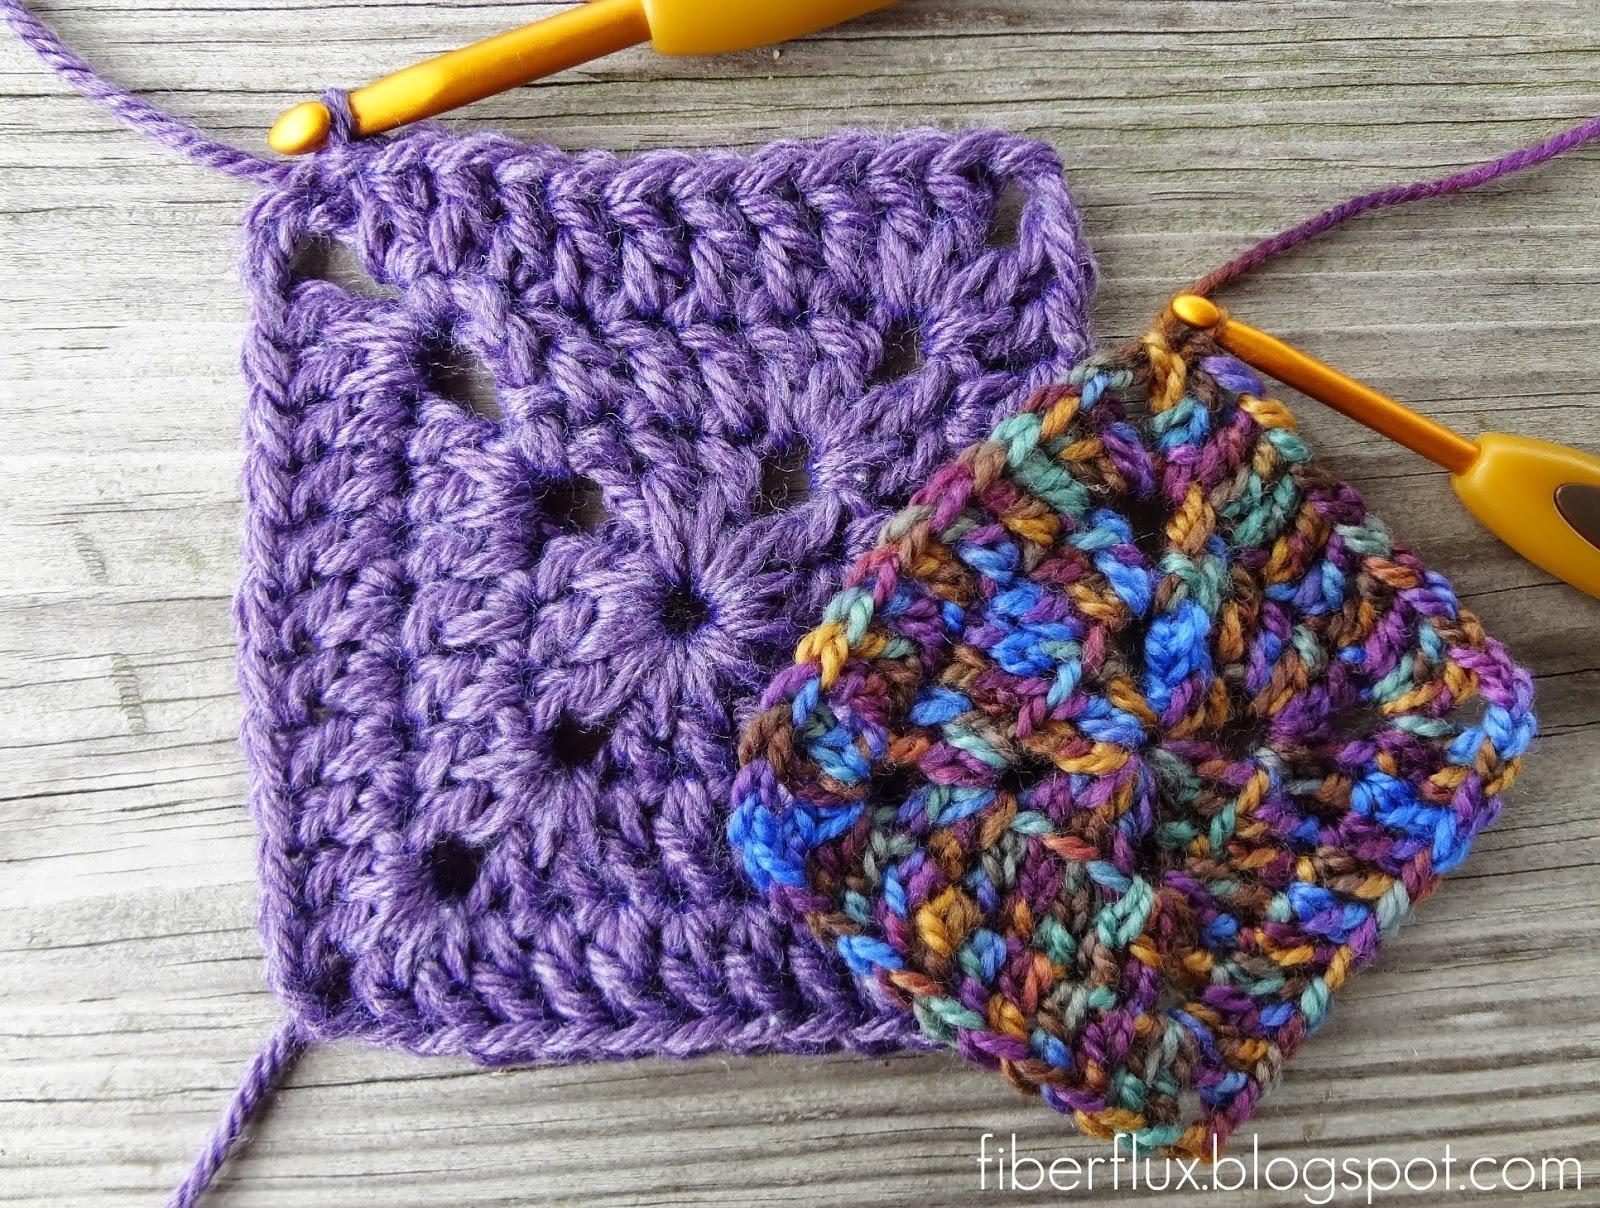 How To Crochet A Granny Square Beginners Tutorial : Fiber Flux: Crochet Tutorials